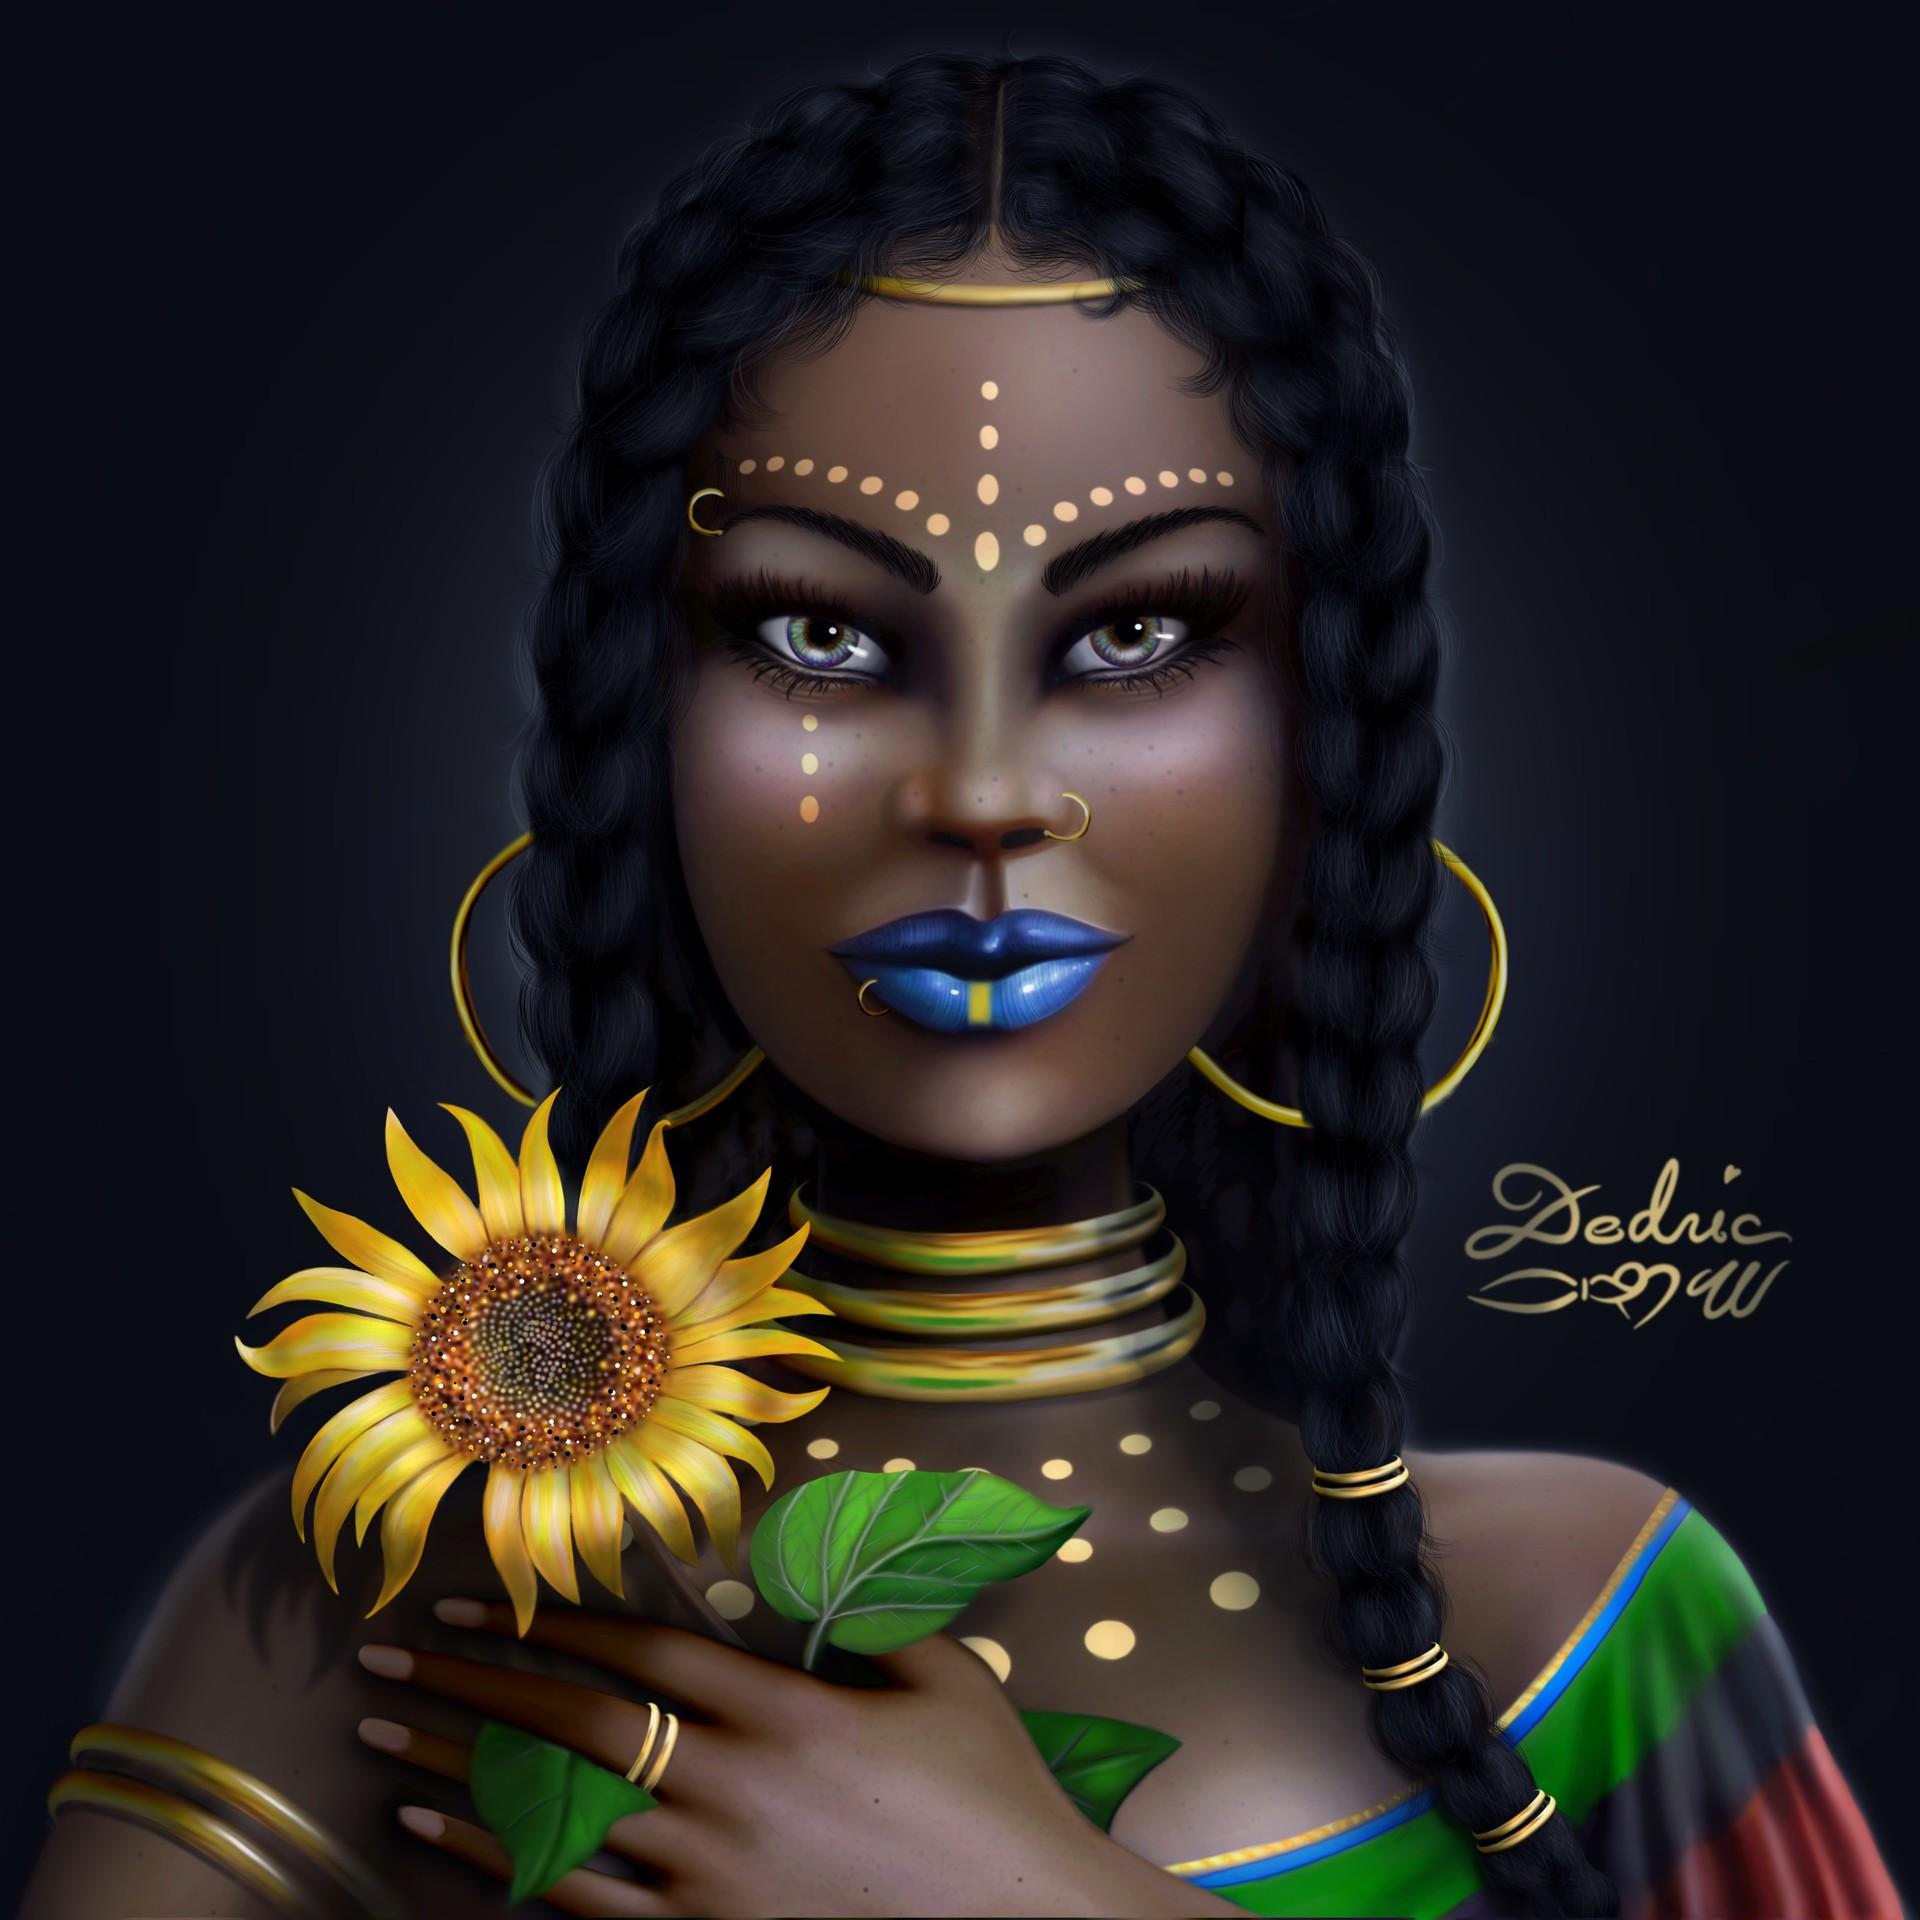 americas digital goddess - 900×900